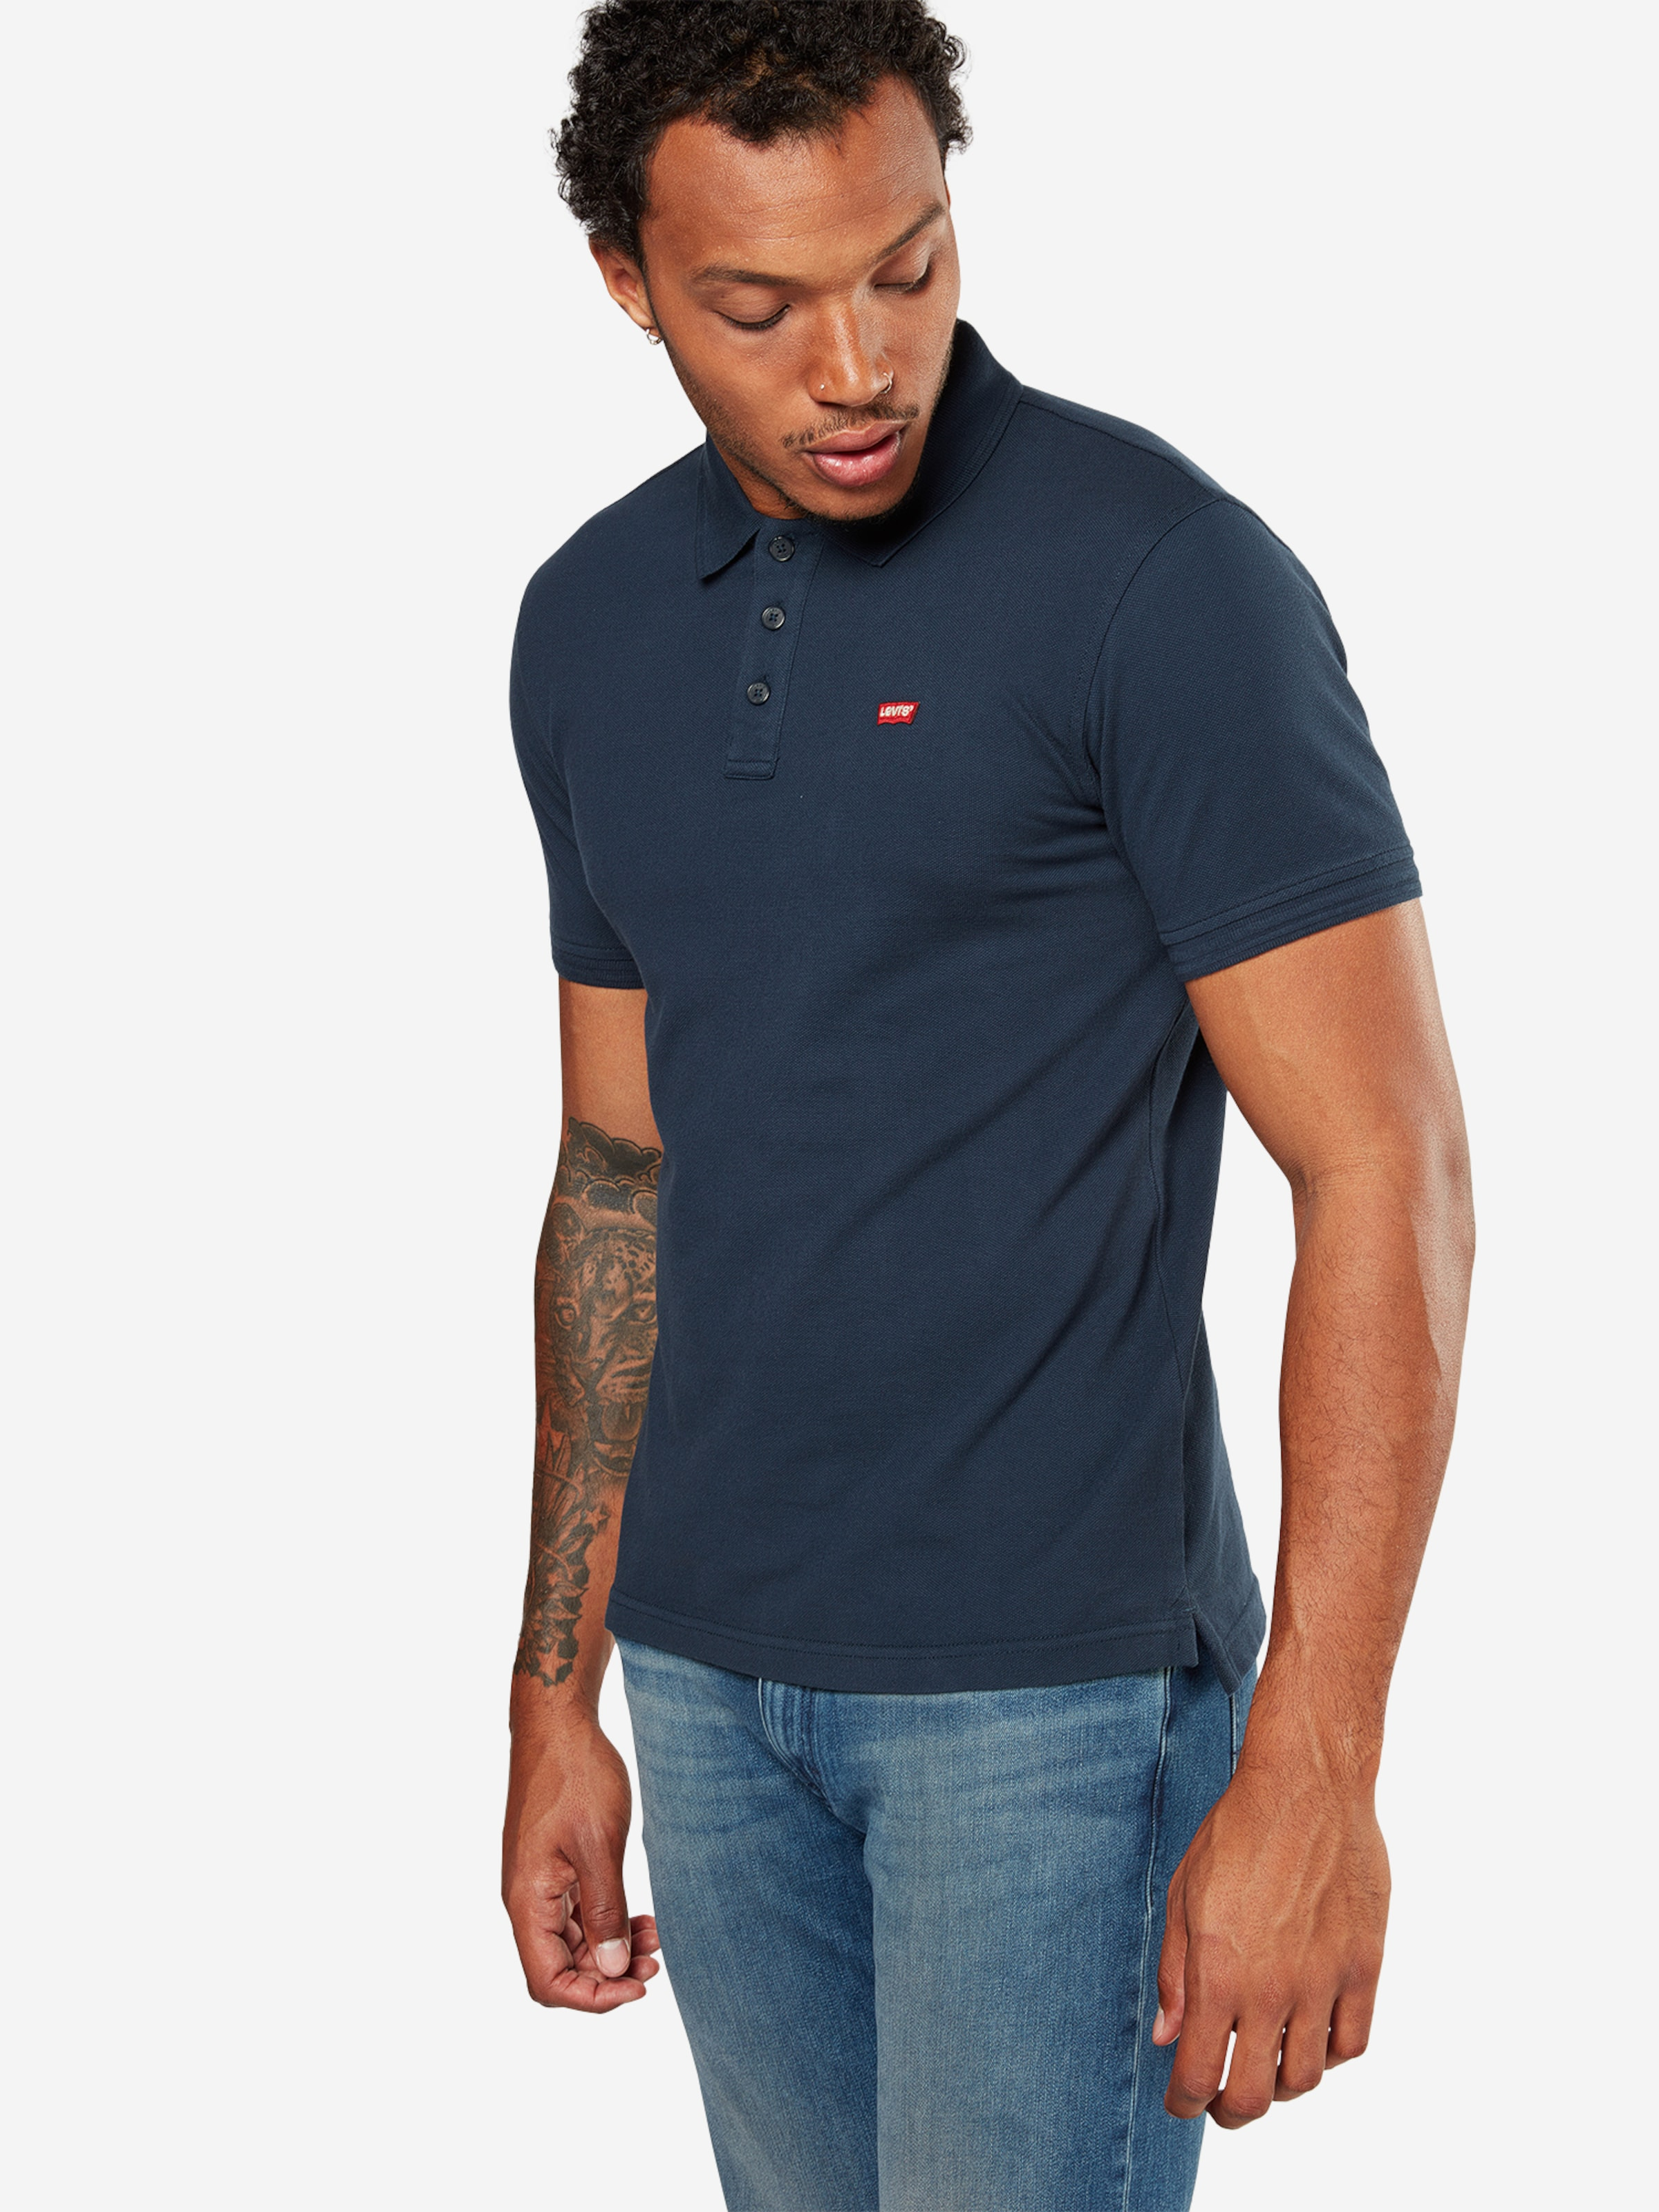 T Bleu Levi's shirt En Foncé 'housemark' by6v7gYf